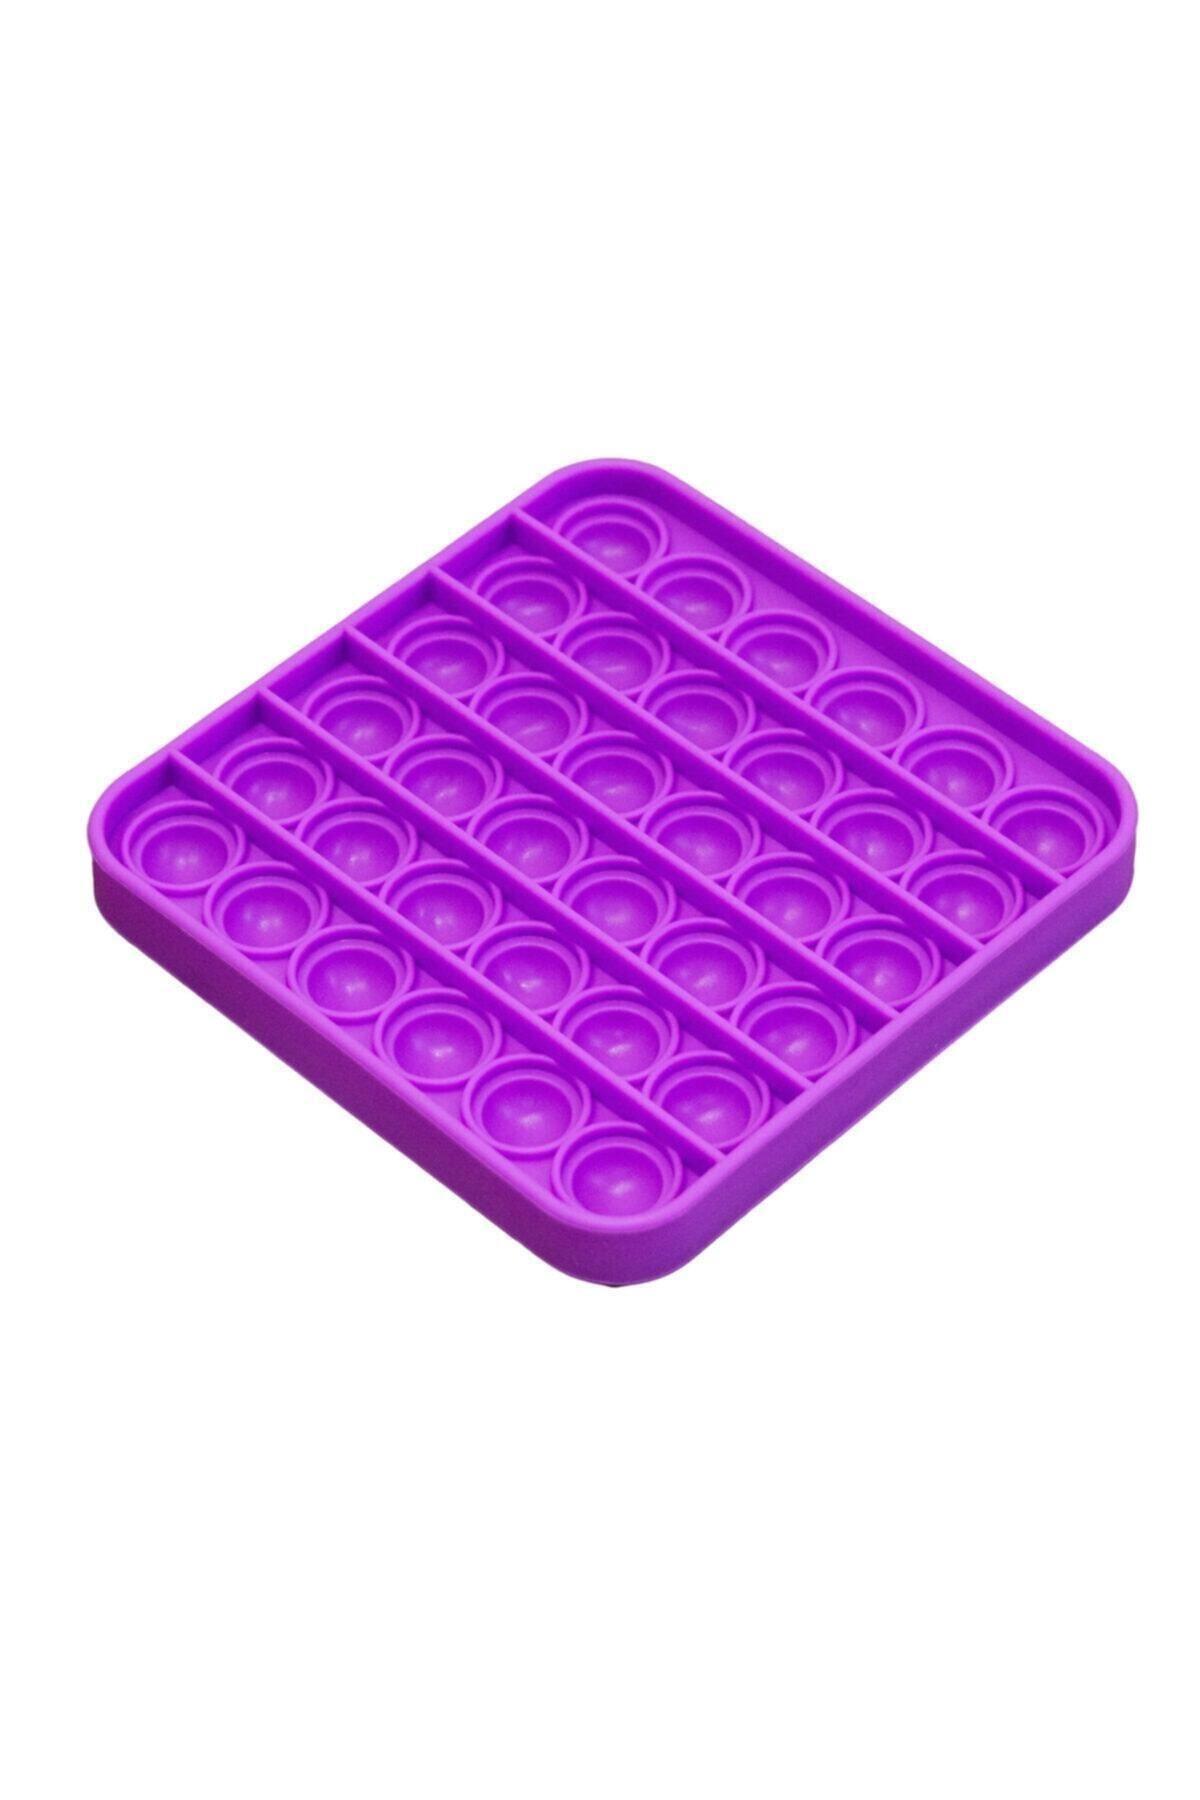 Başel Toys Push Bubble Fidget Özel Pop Duyusal Oyuncak Zihinsel Stres ( Mor Renk, Kare)